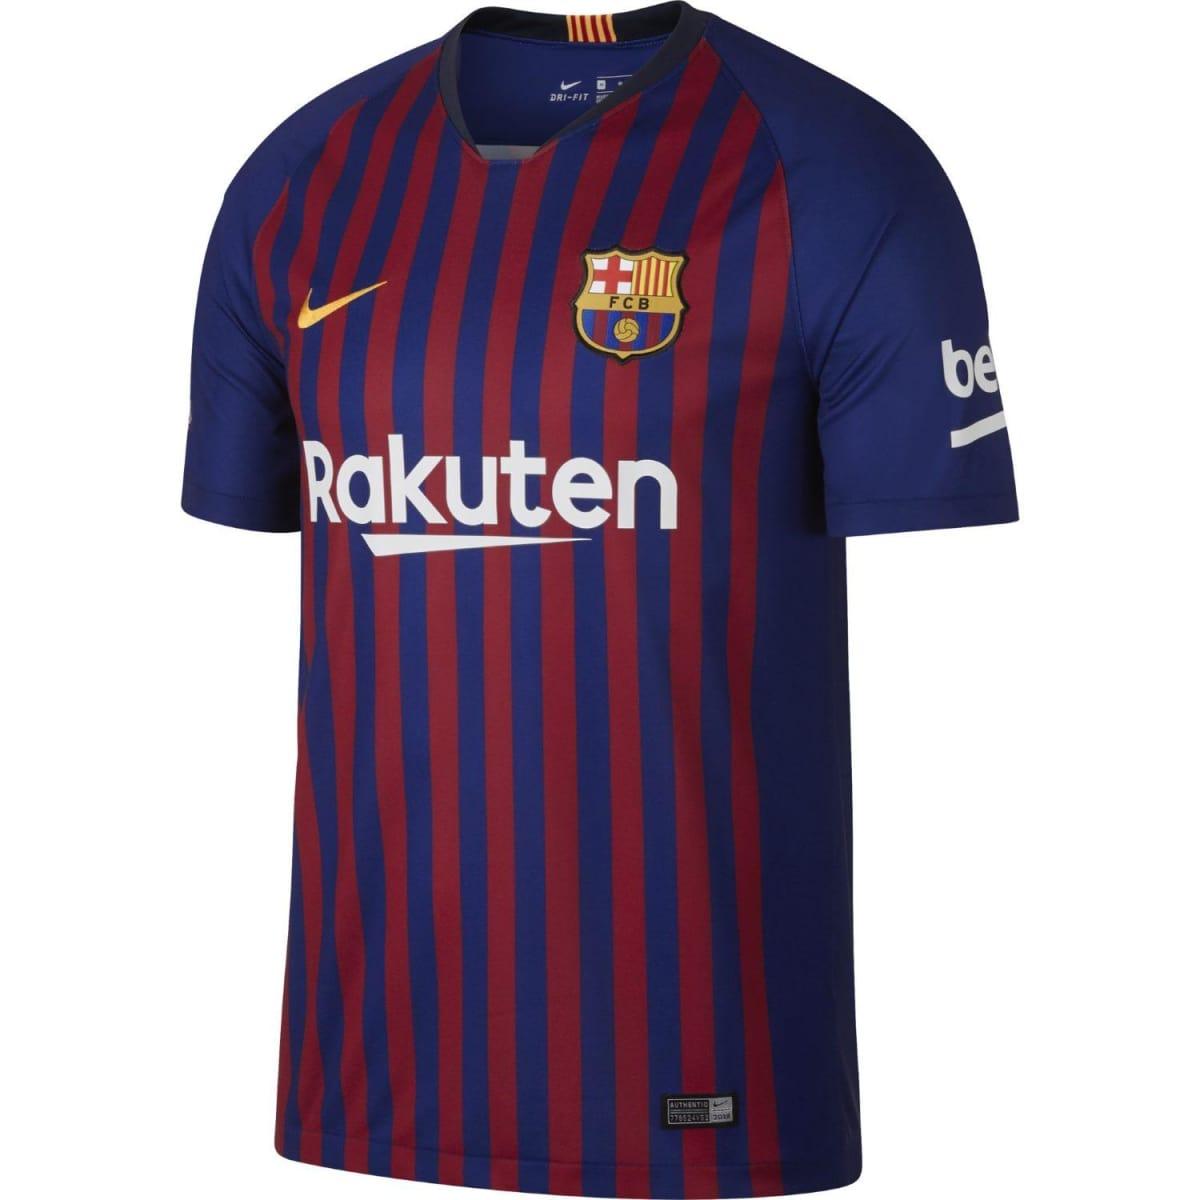 reputable site b9017 21f66 Cheap Football Shirts Uk Replica - DREAMWORKS